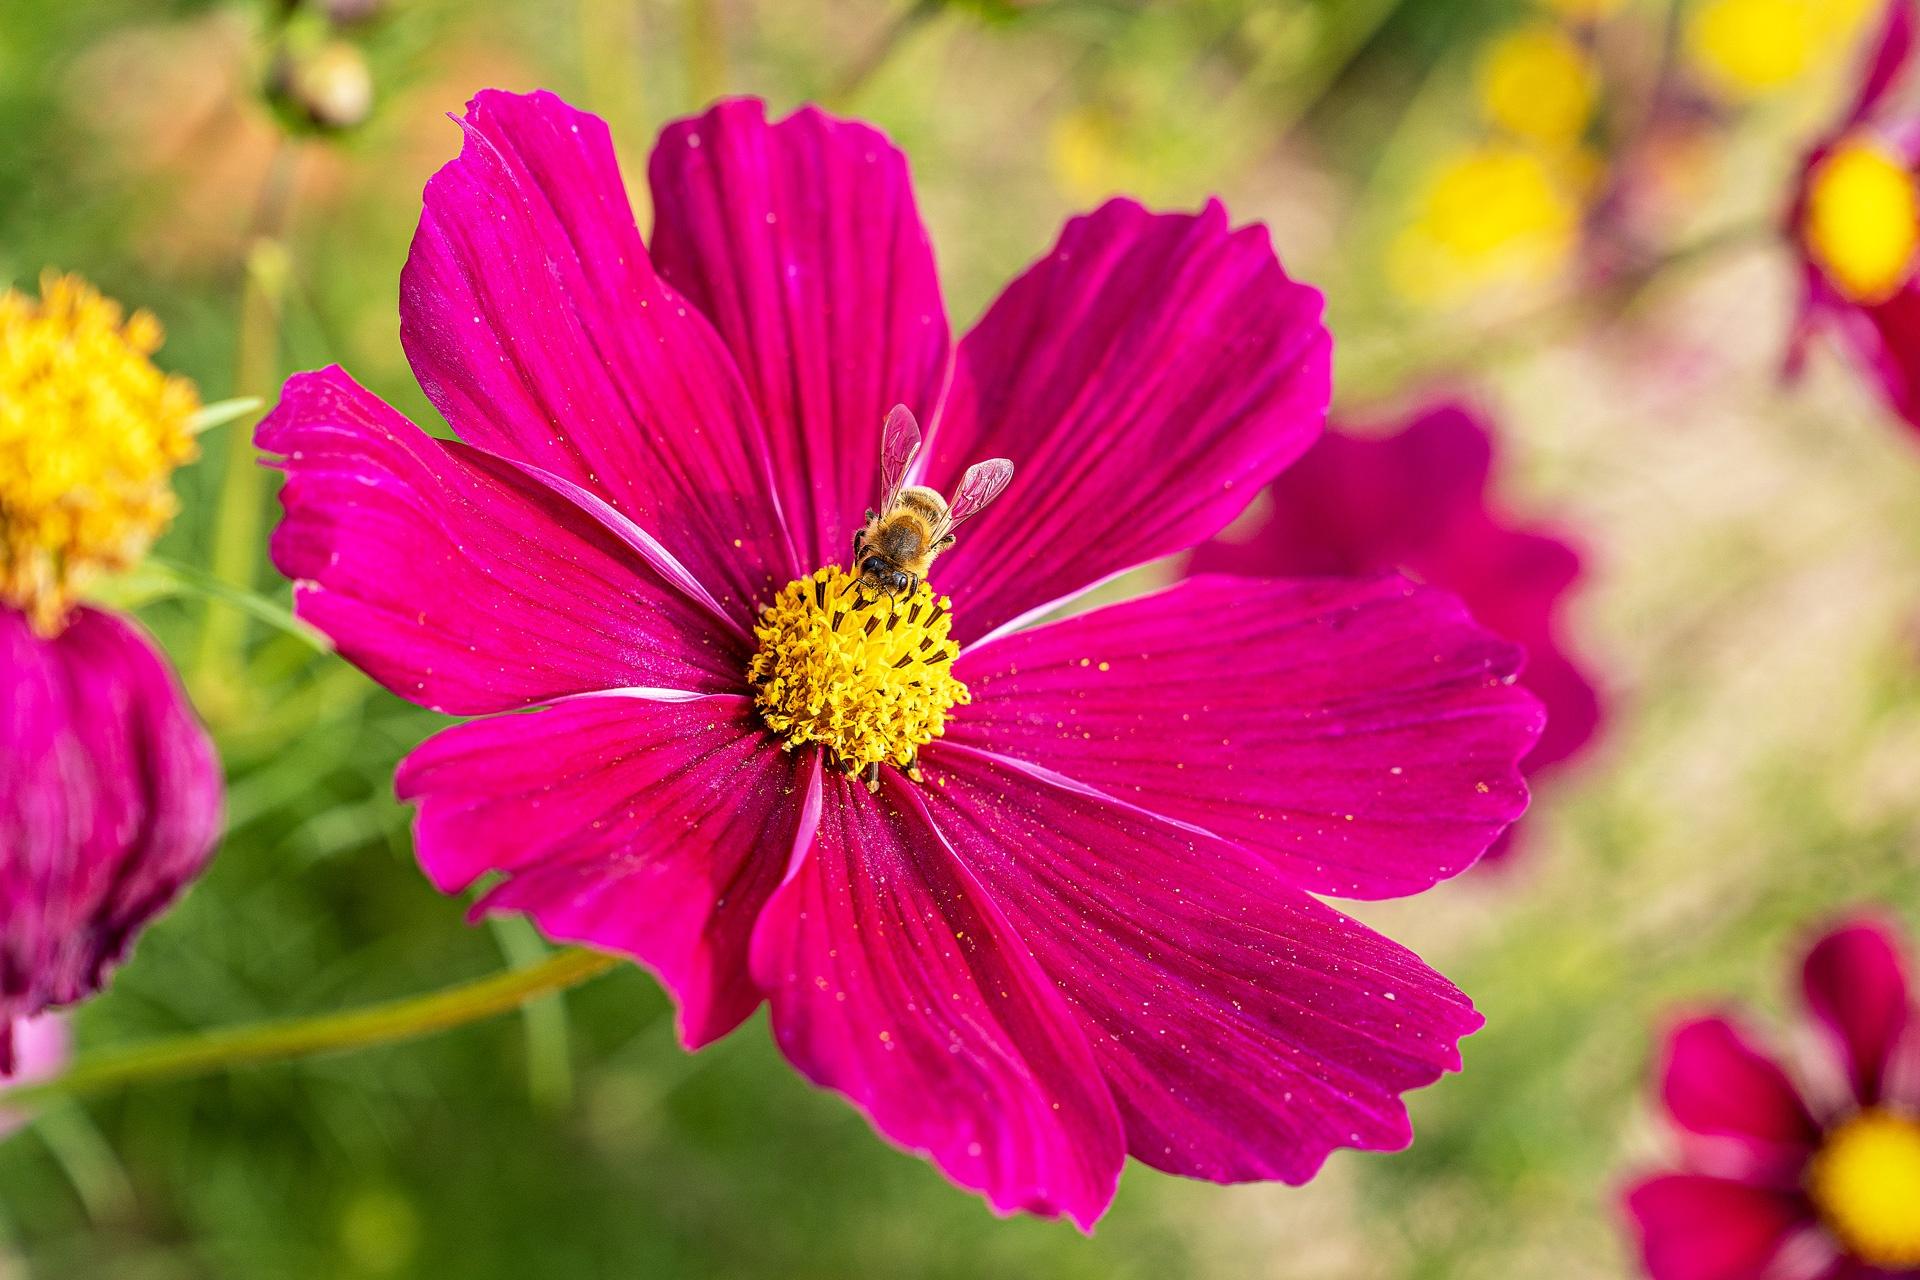 Gärtnerei Schunke – Cosmea Pink Mit Biene